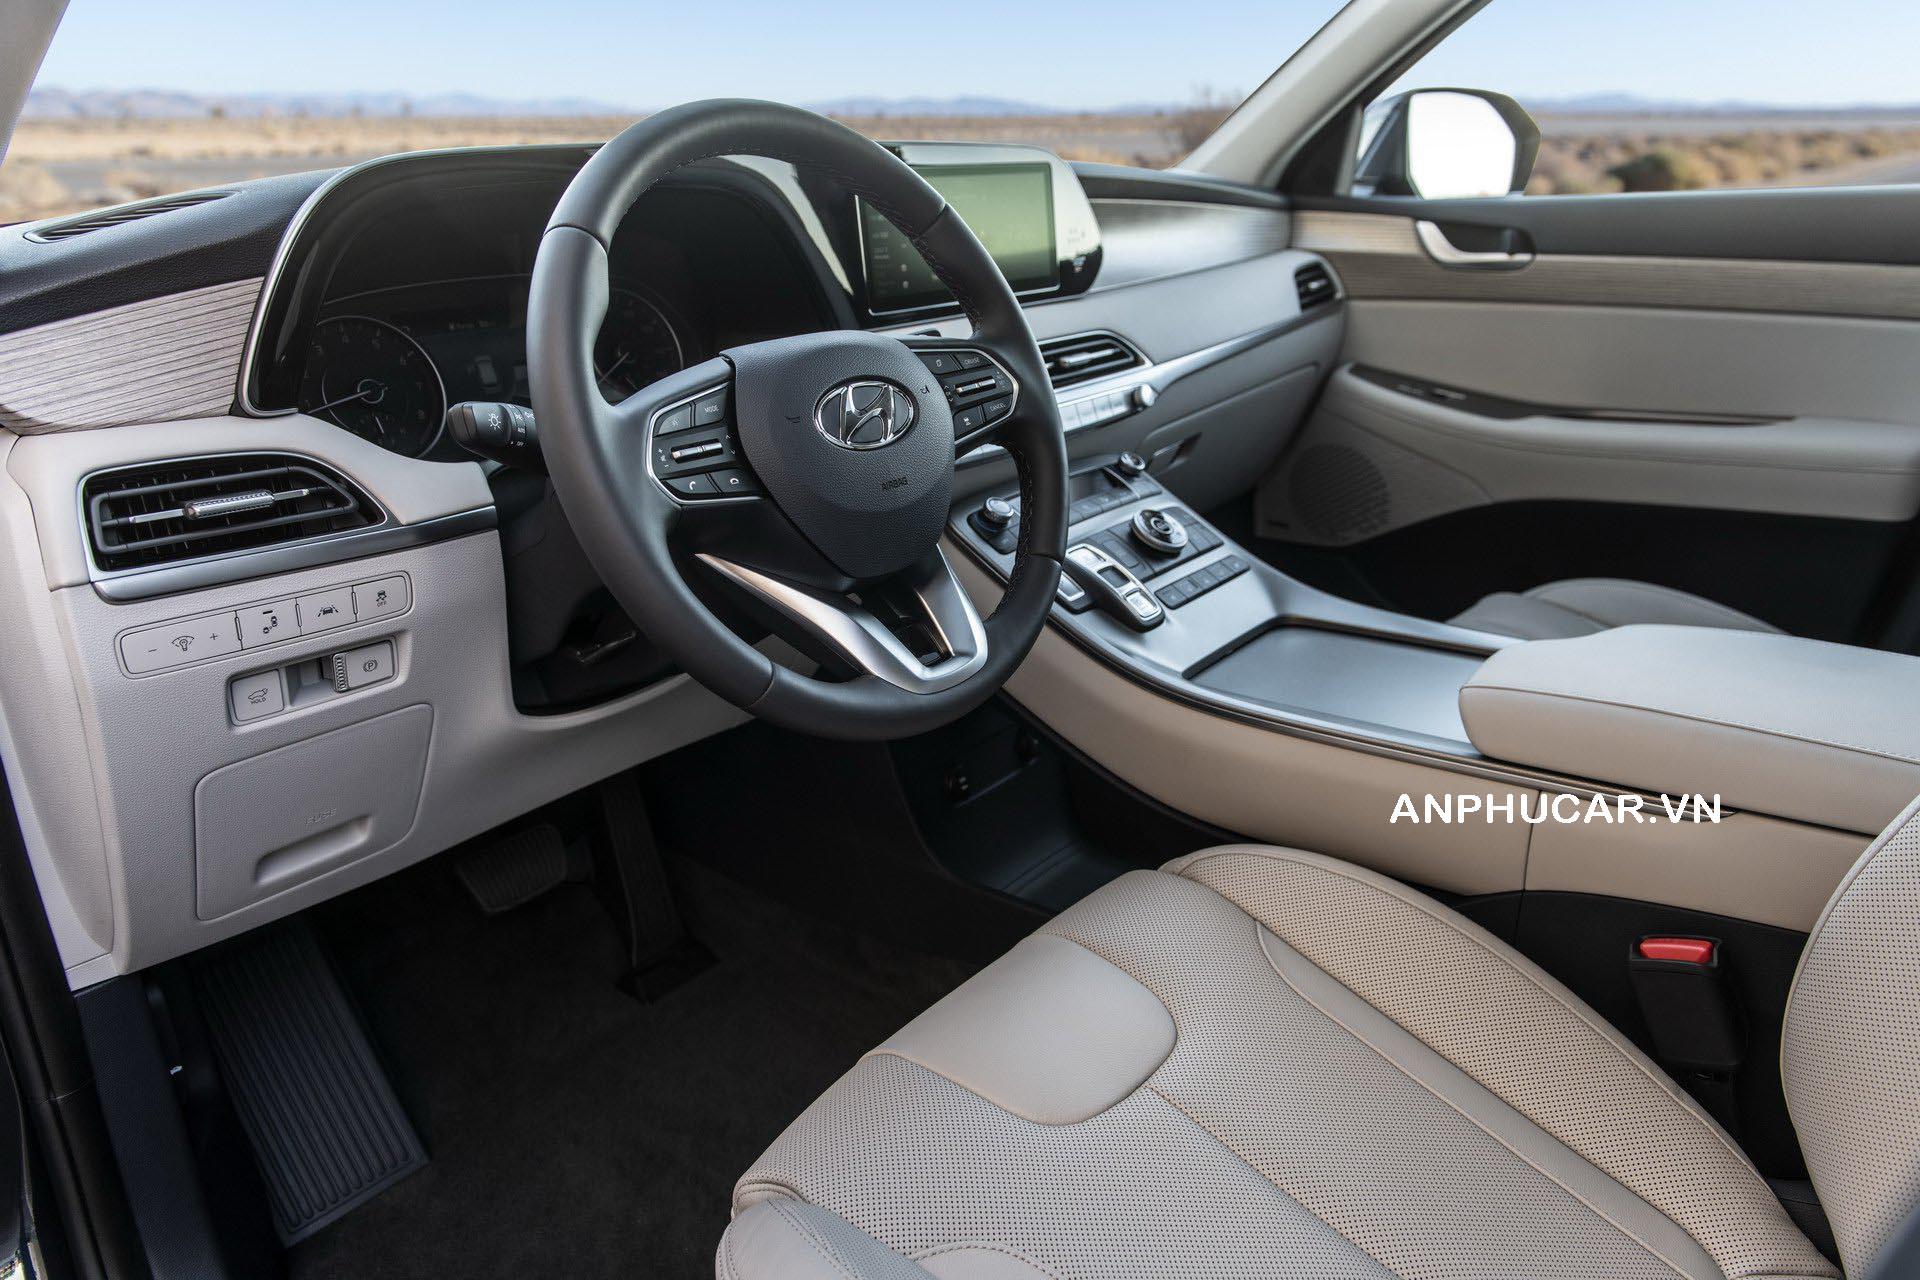 Hyundai Palisade 2020 ngoại thất nội thất xe